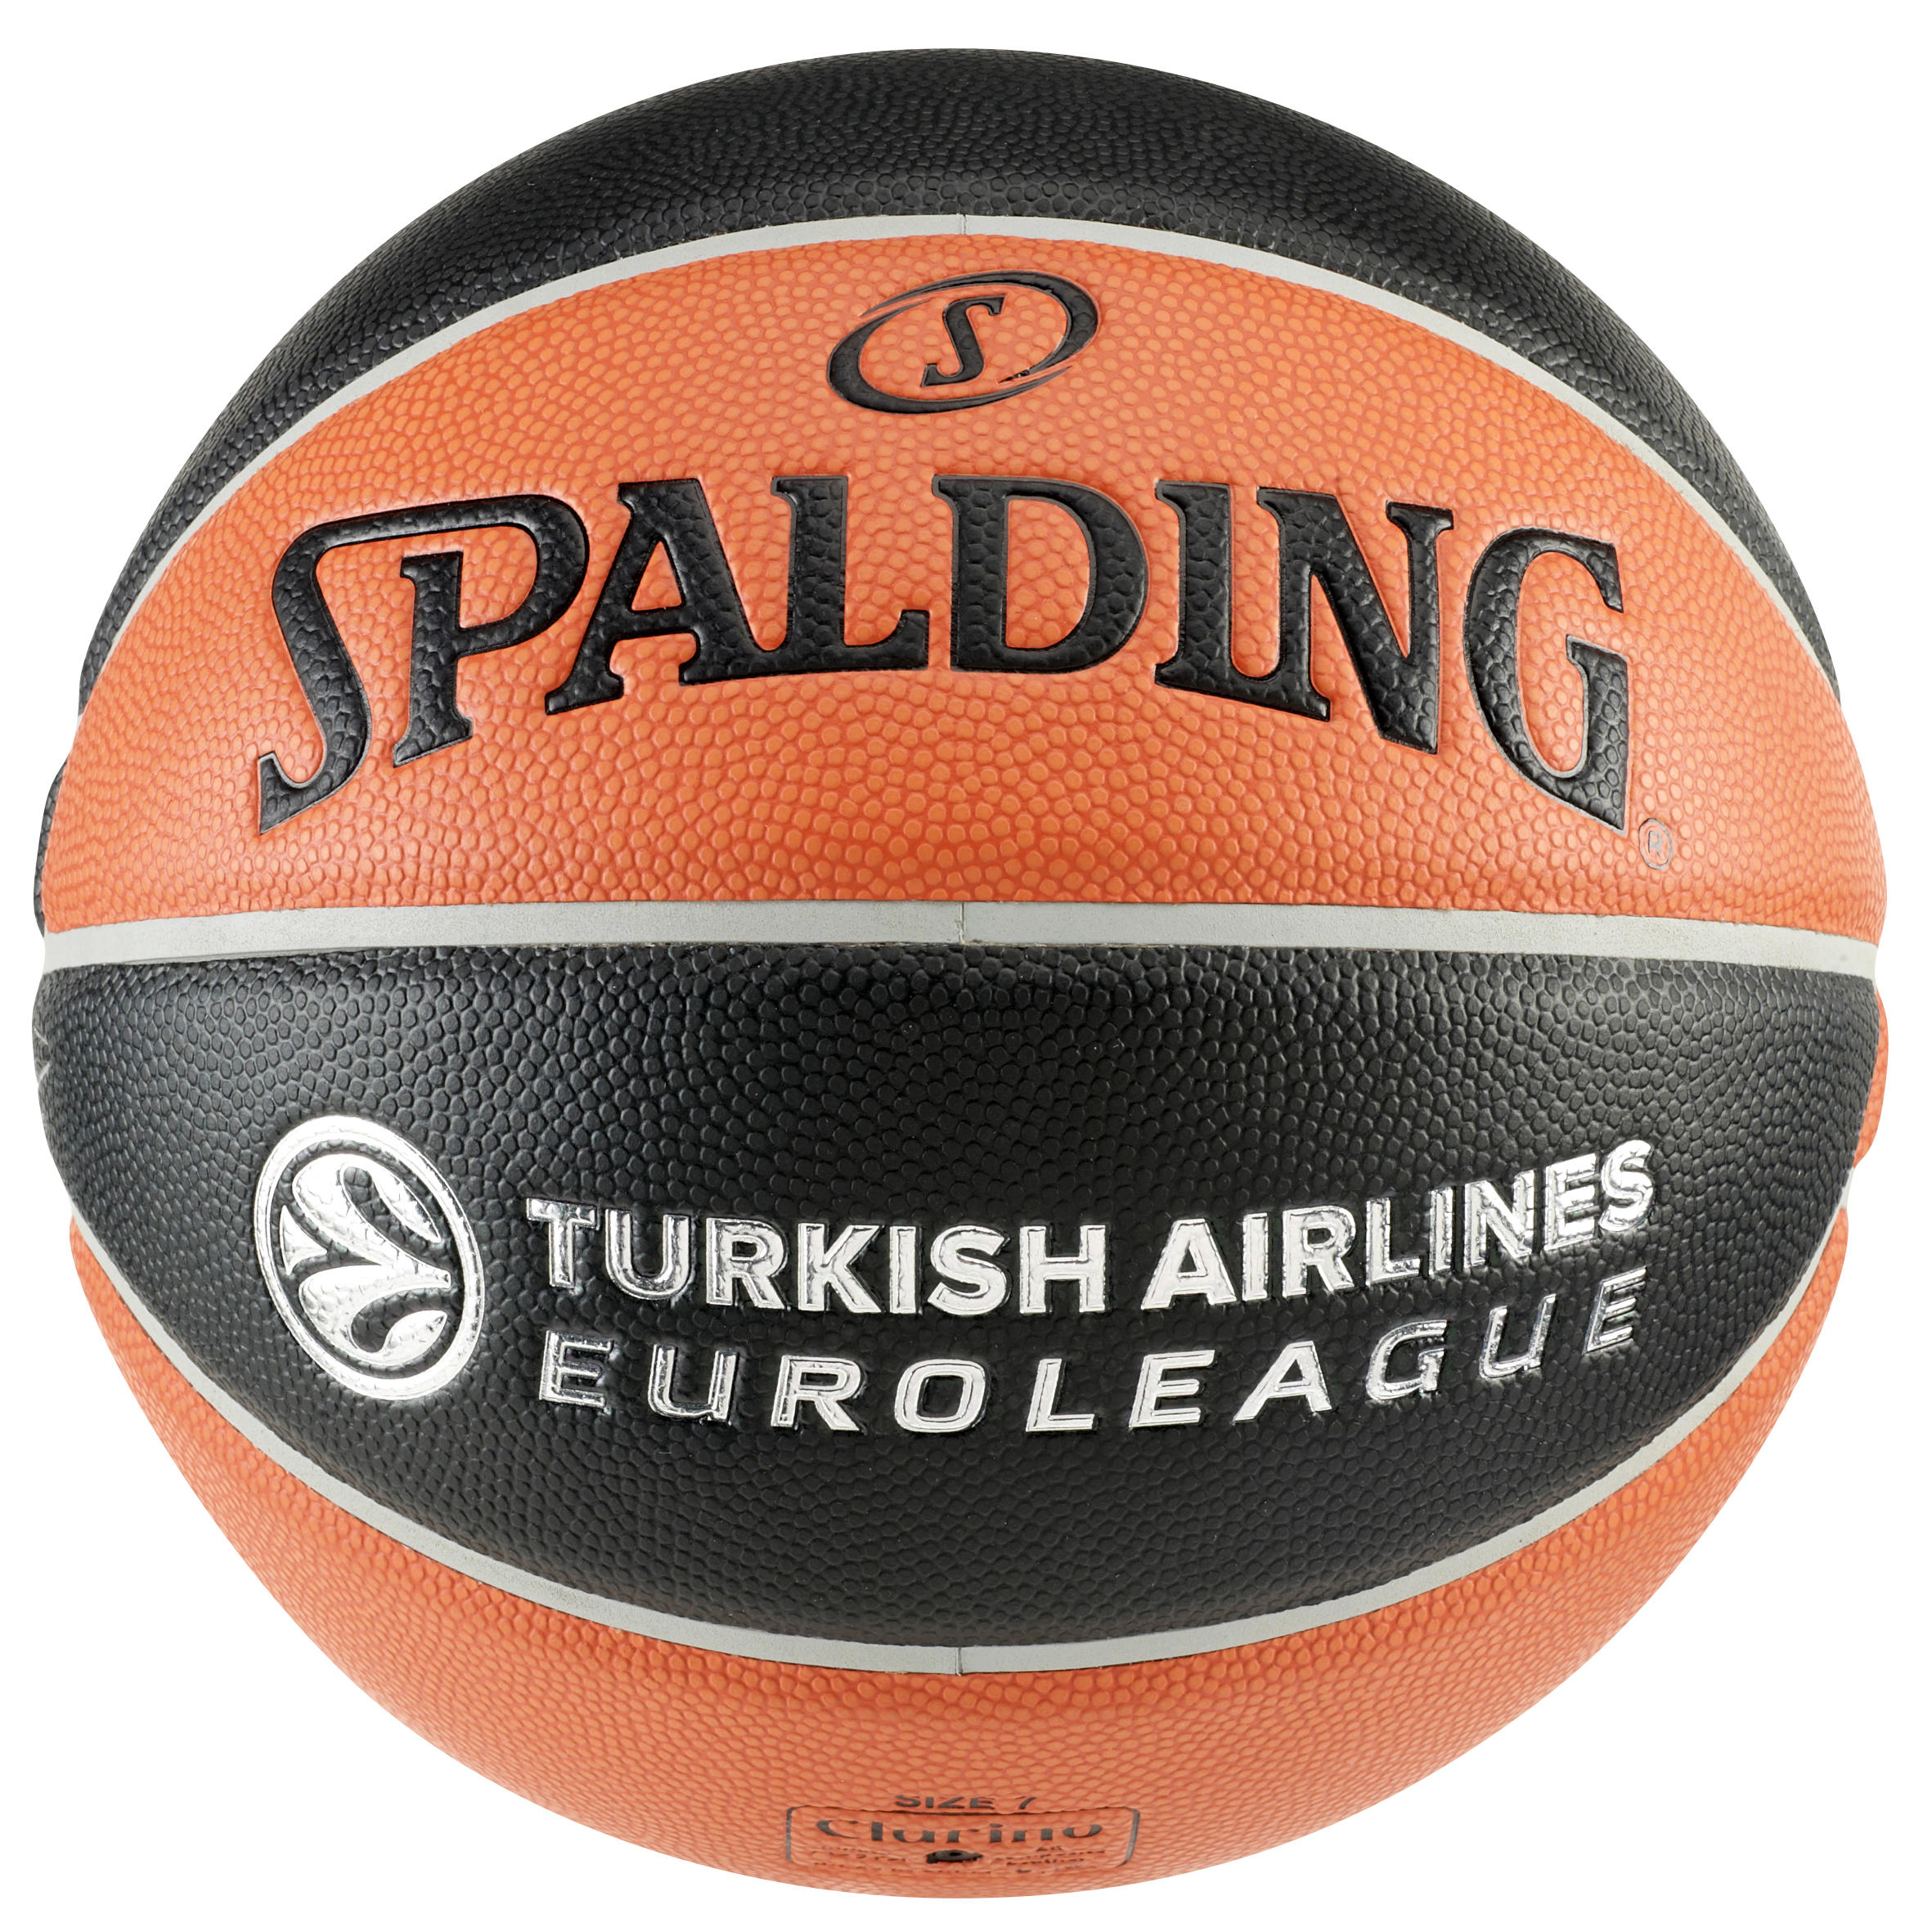 Spalding Basketbal TF 1000 EuroLeague maat 7